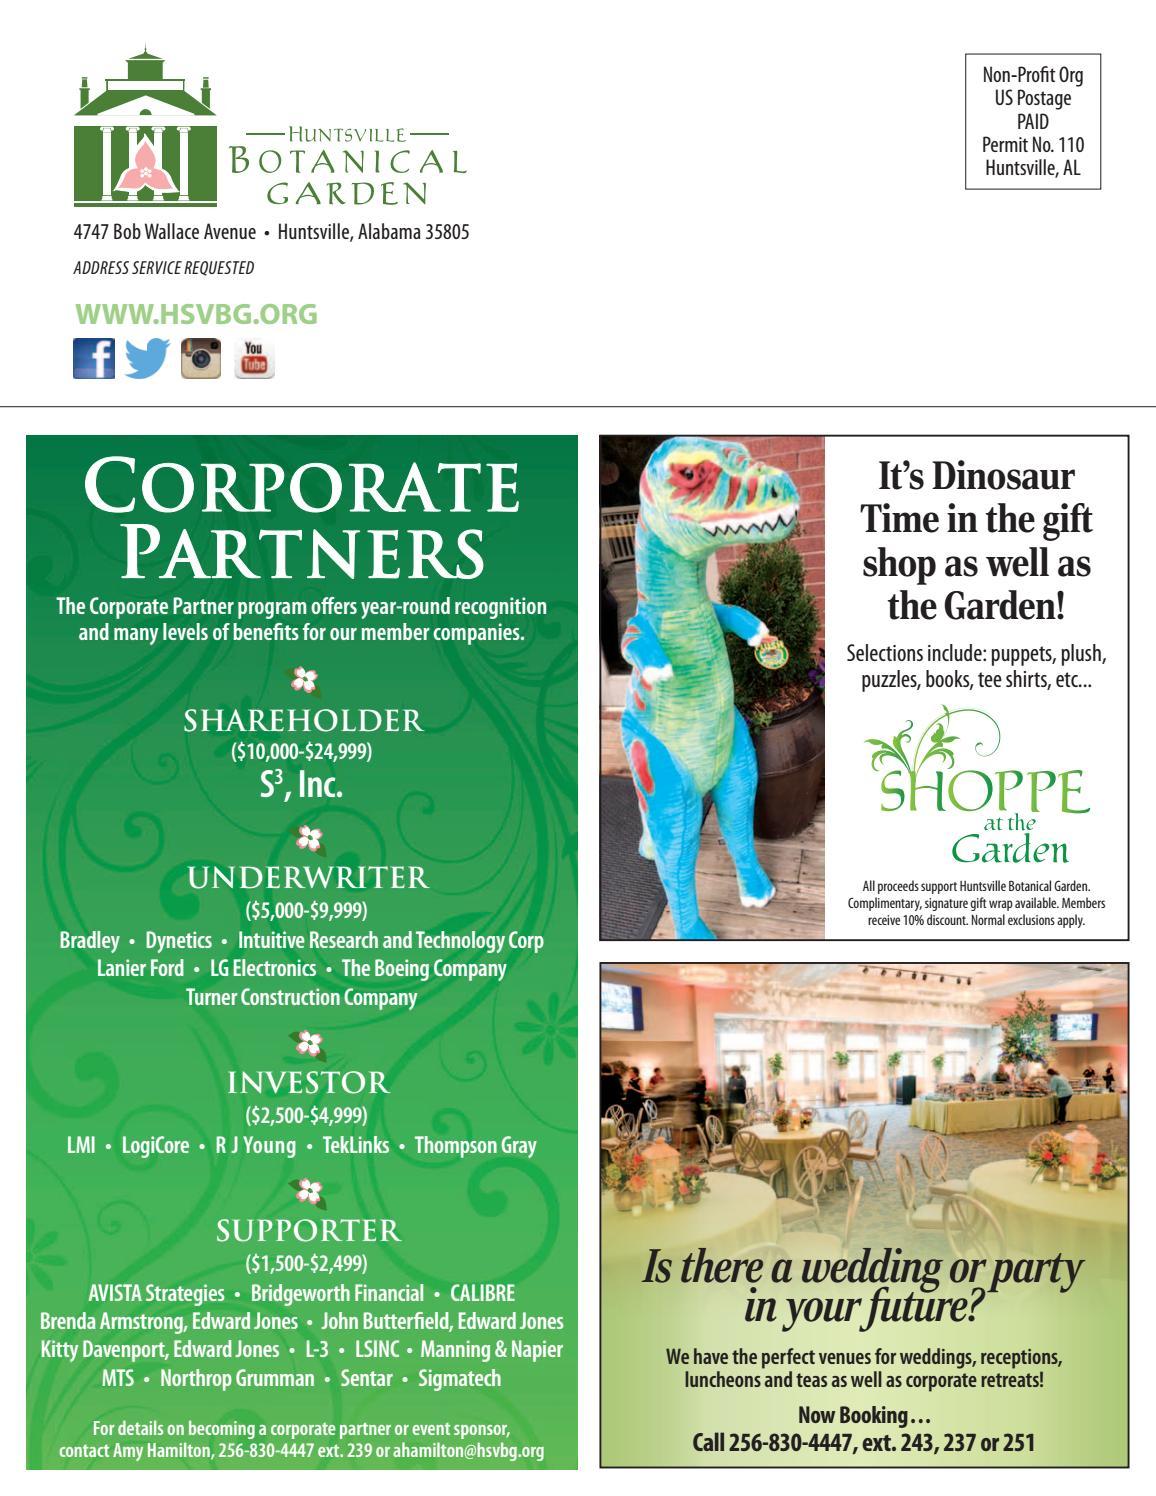 HBG Garden Columns - May June July 2017 by Huntsville Botanical